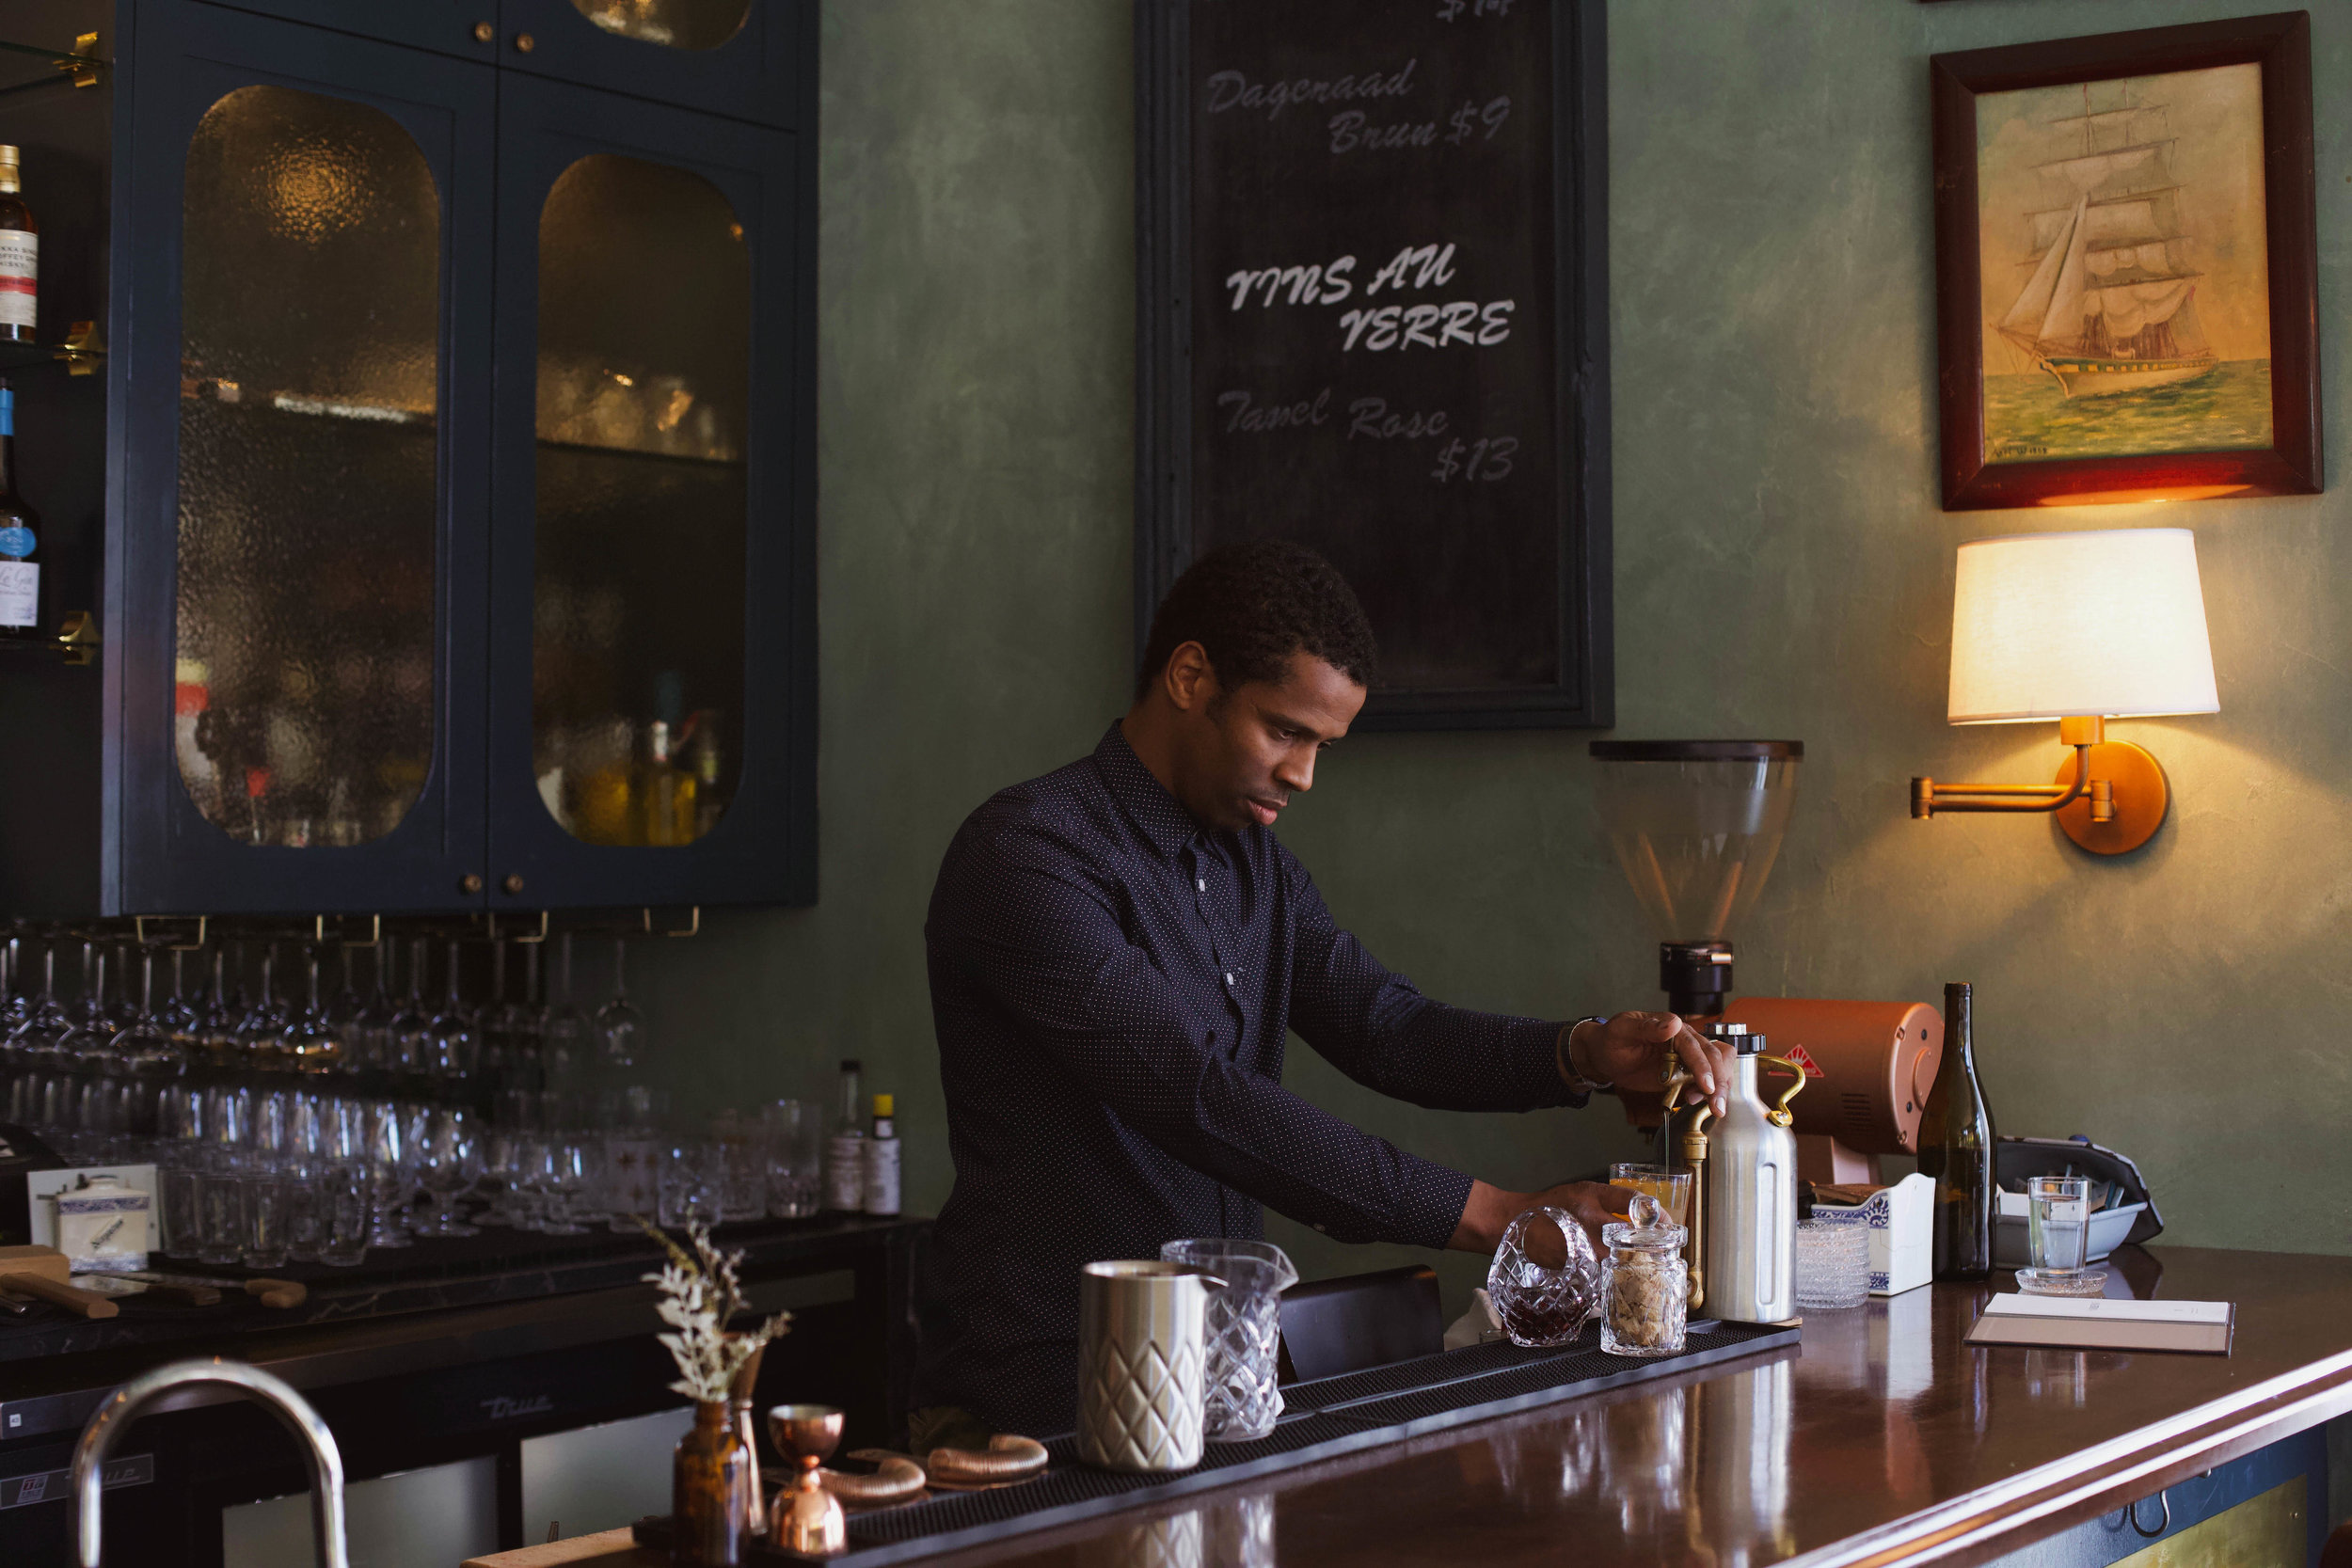 Head bartender Yacine Sylla pours house-made iced tea from his mini growler keg